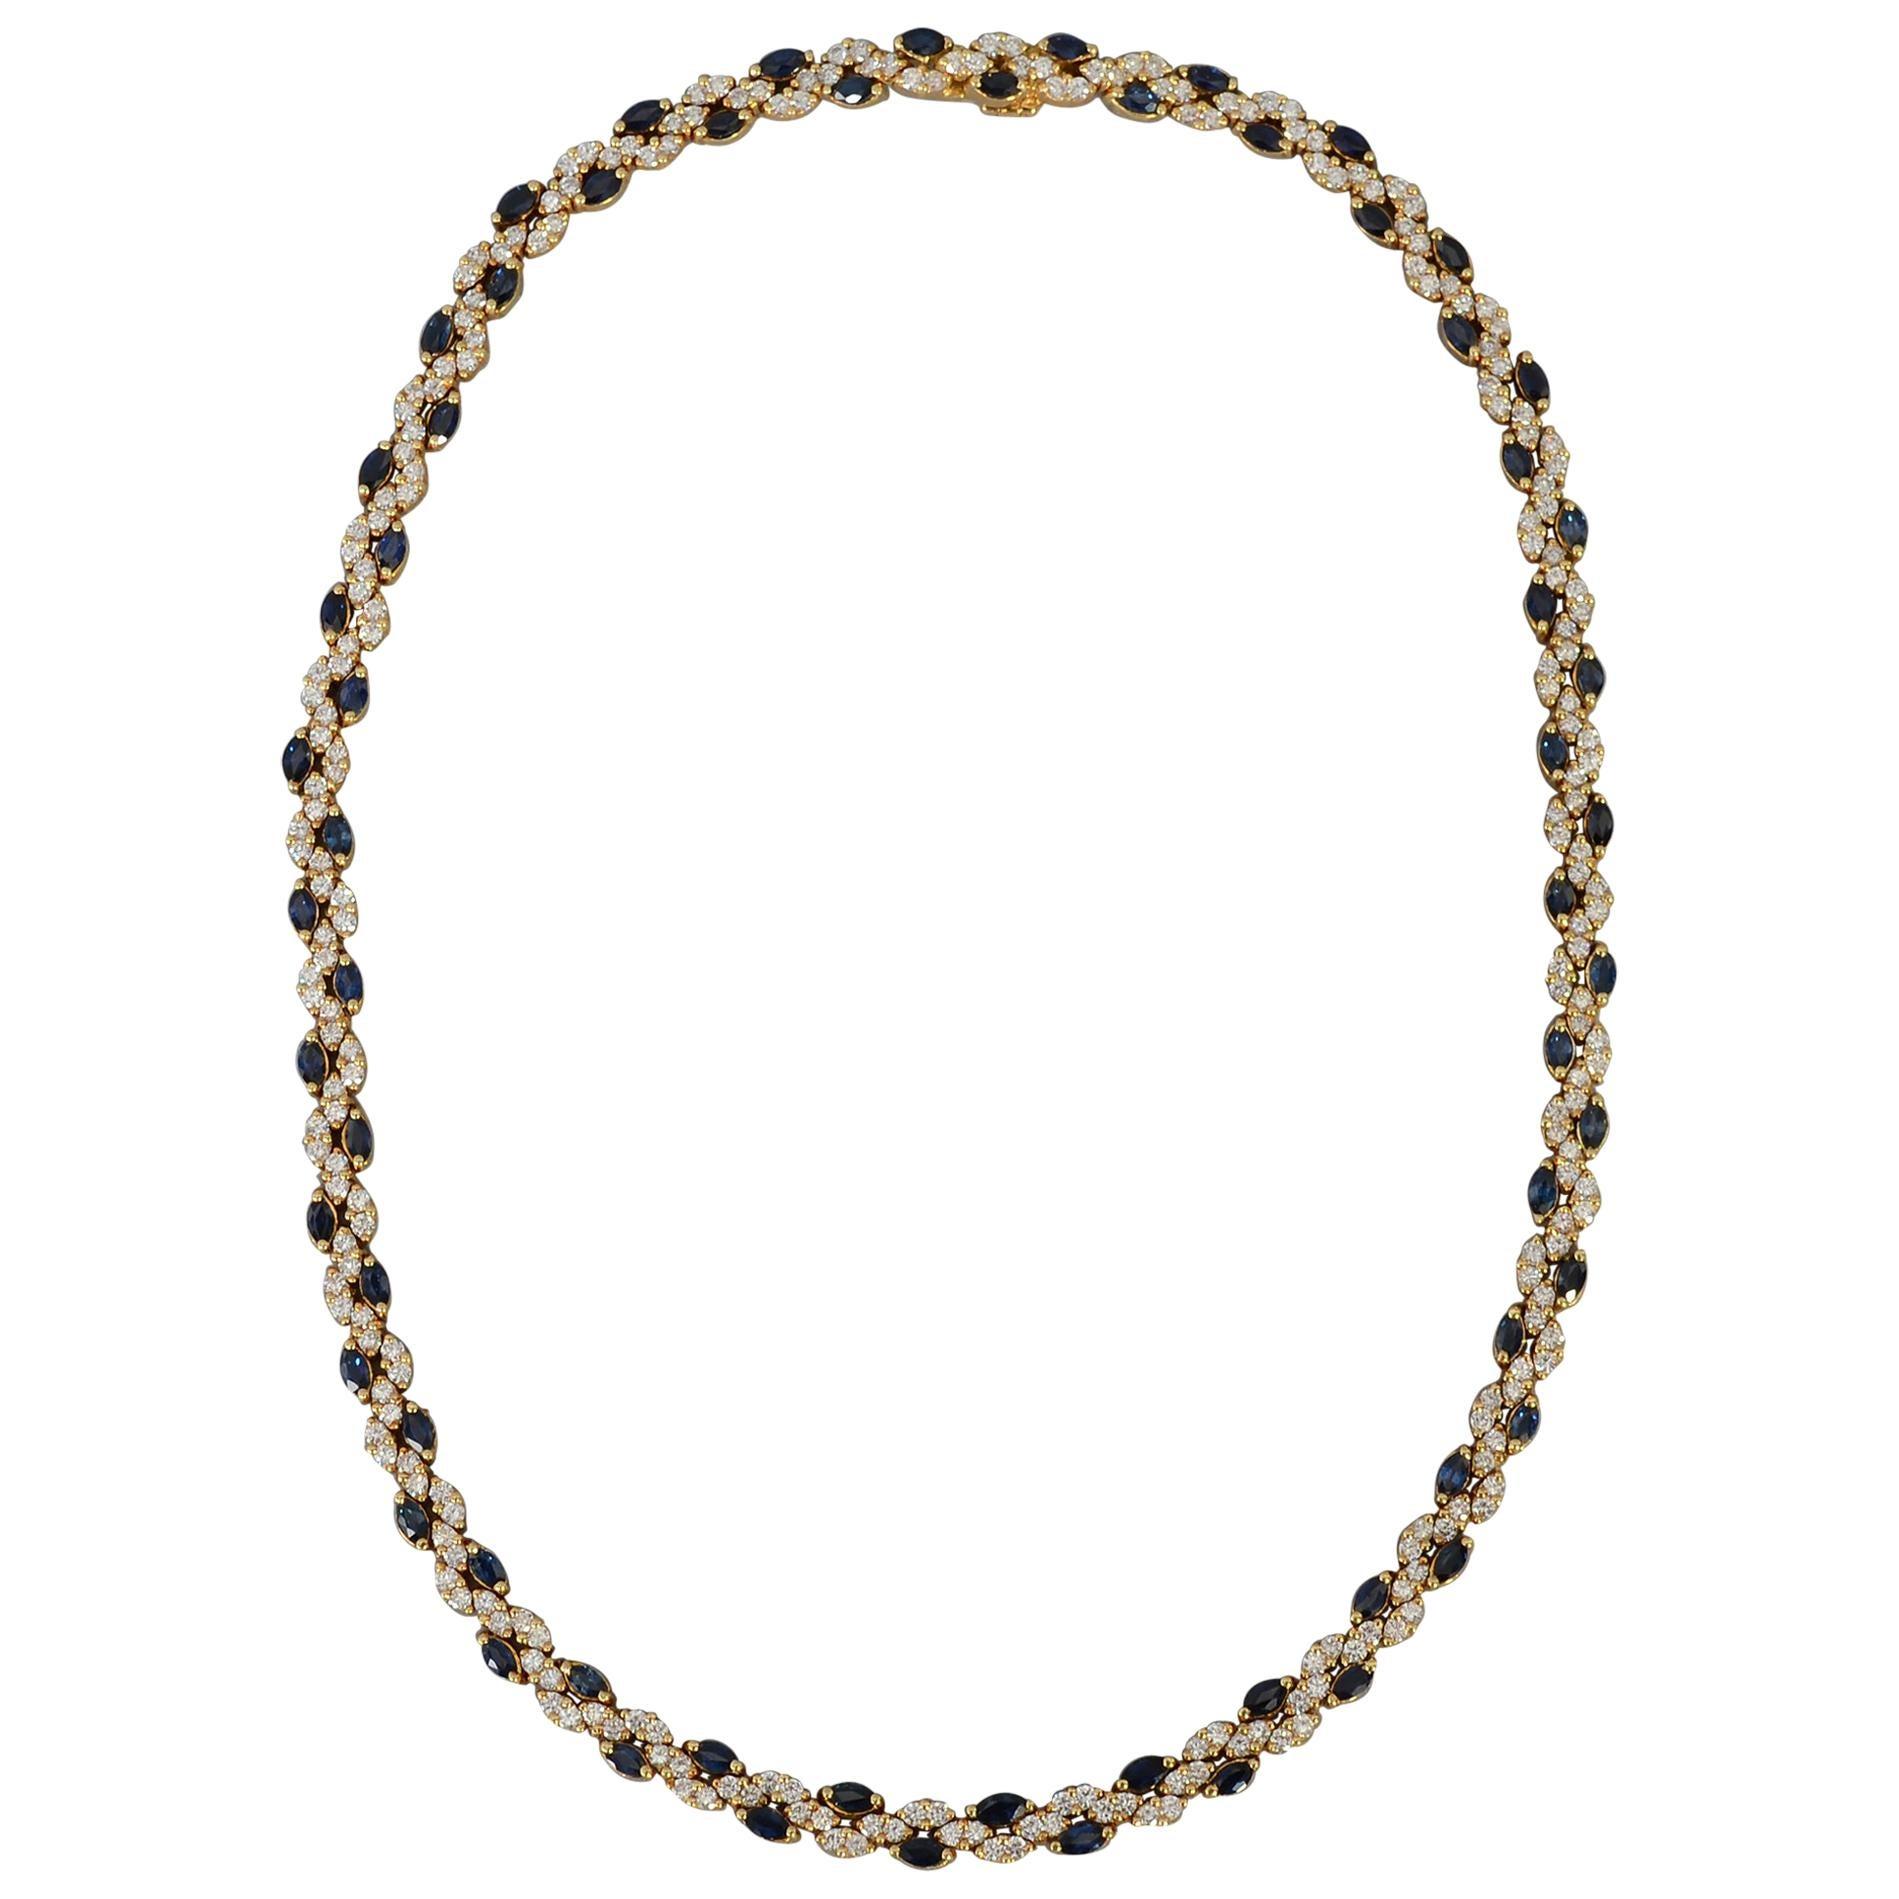 Hammerman Brothers Sapphire and Diamond Choker Necklace